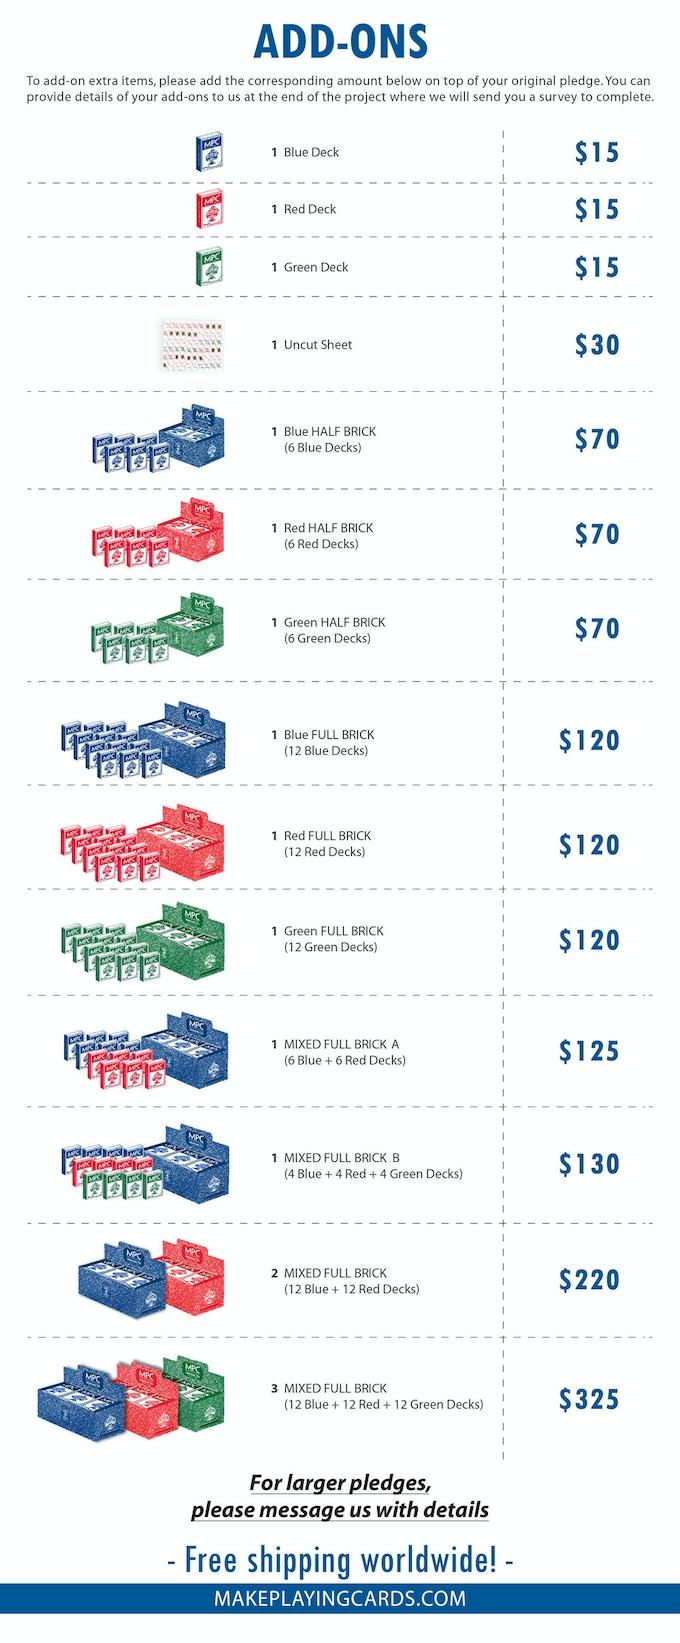 Add-ons price list